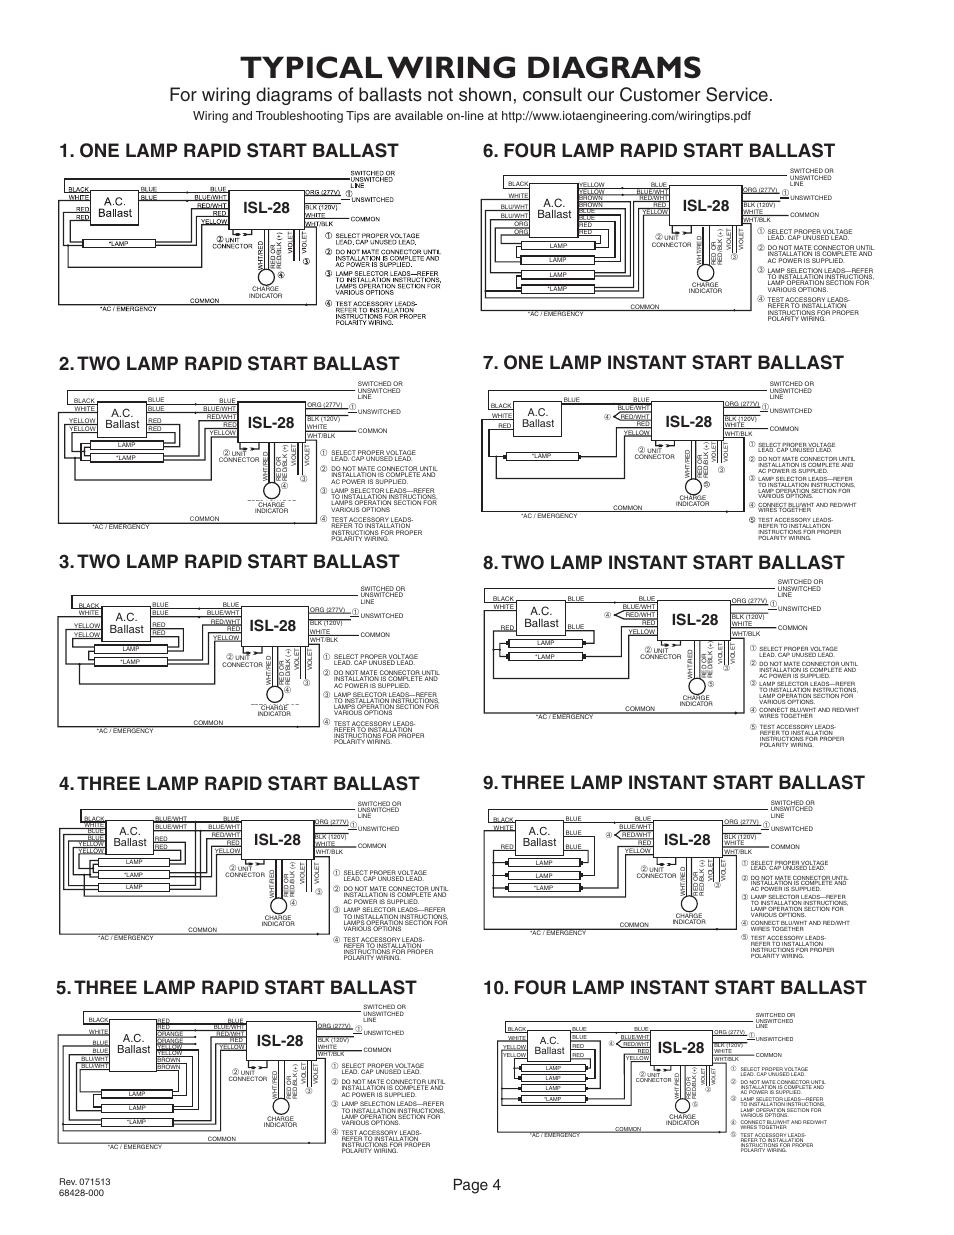 iota isl 28 page4?resize=840%2C1087 iota emergency ballast wiring diagram periodic & diagrams science iota isl 540 wiring diagram at eliteediting.co